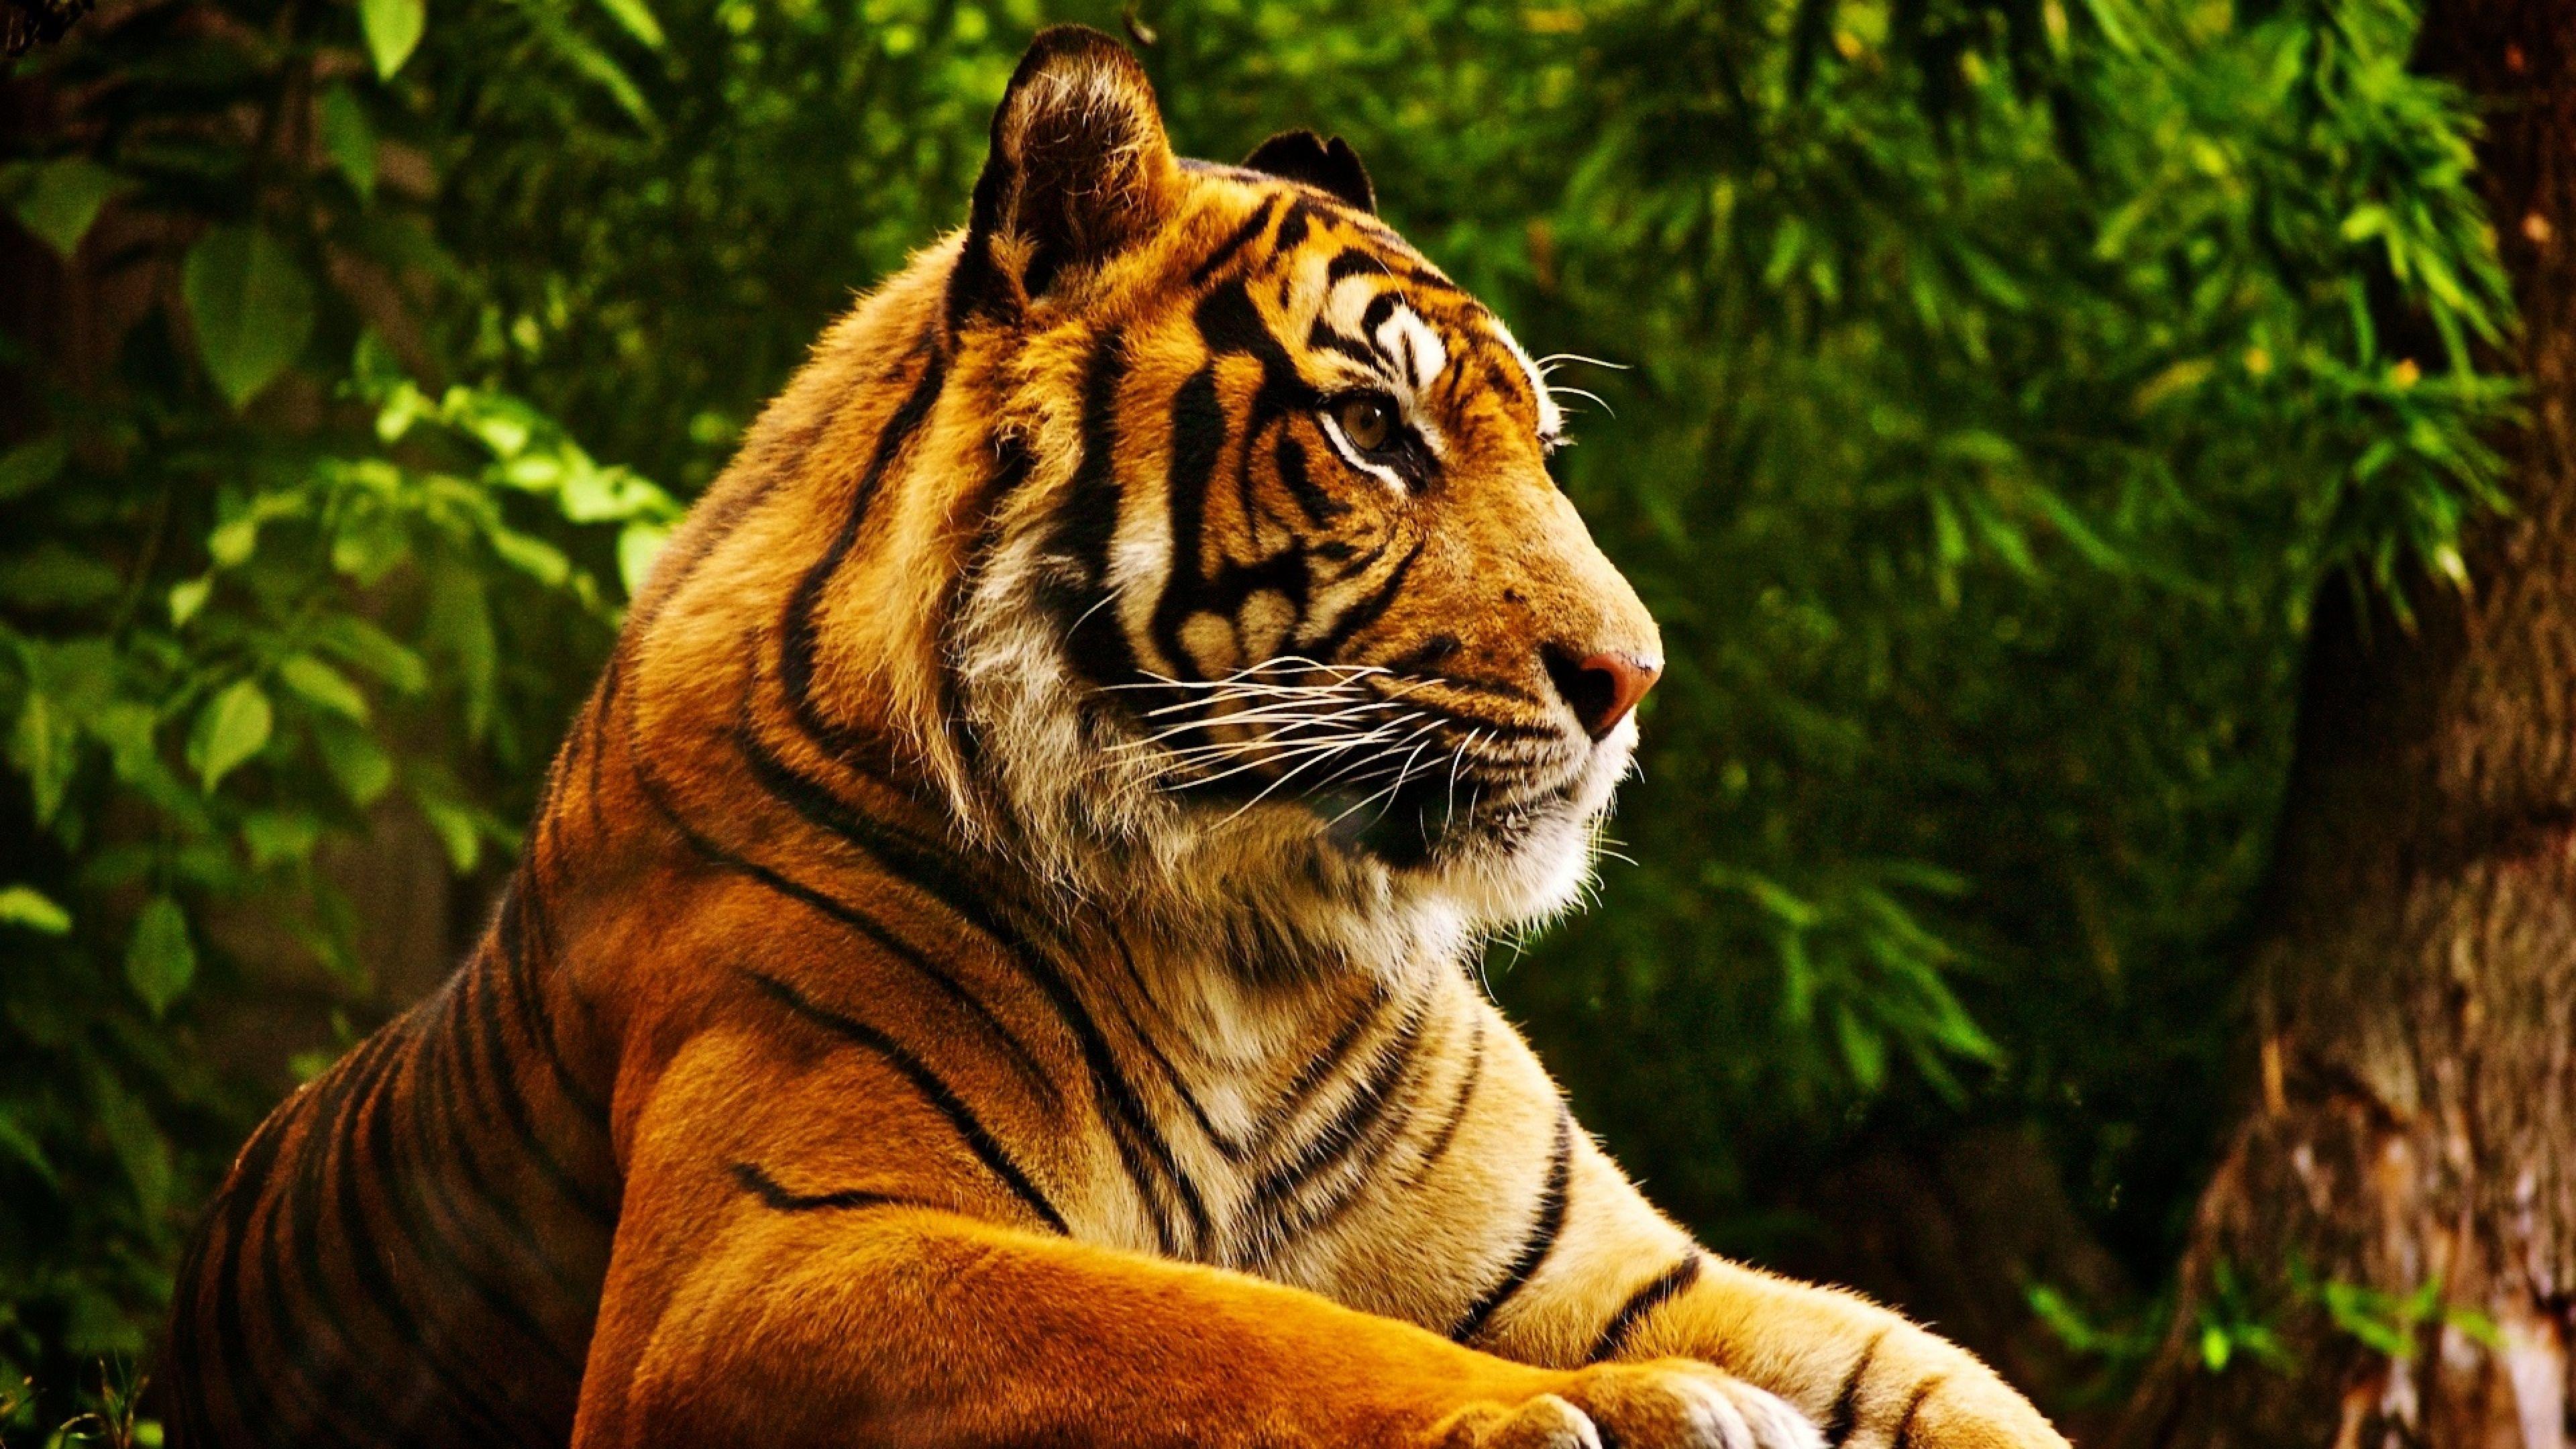 Tiger resting Ultra HD wallpaper UHD WallpapersNet 3840x2160